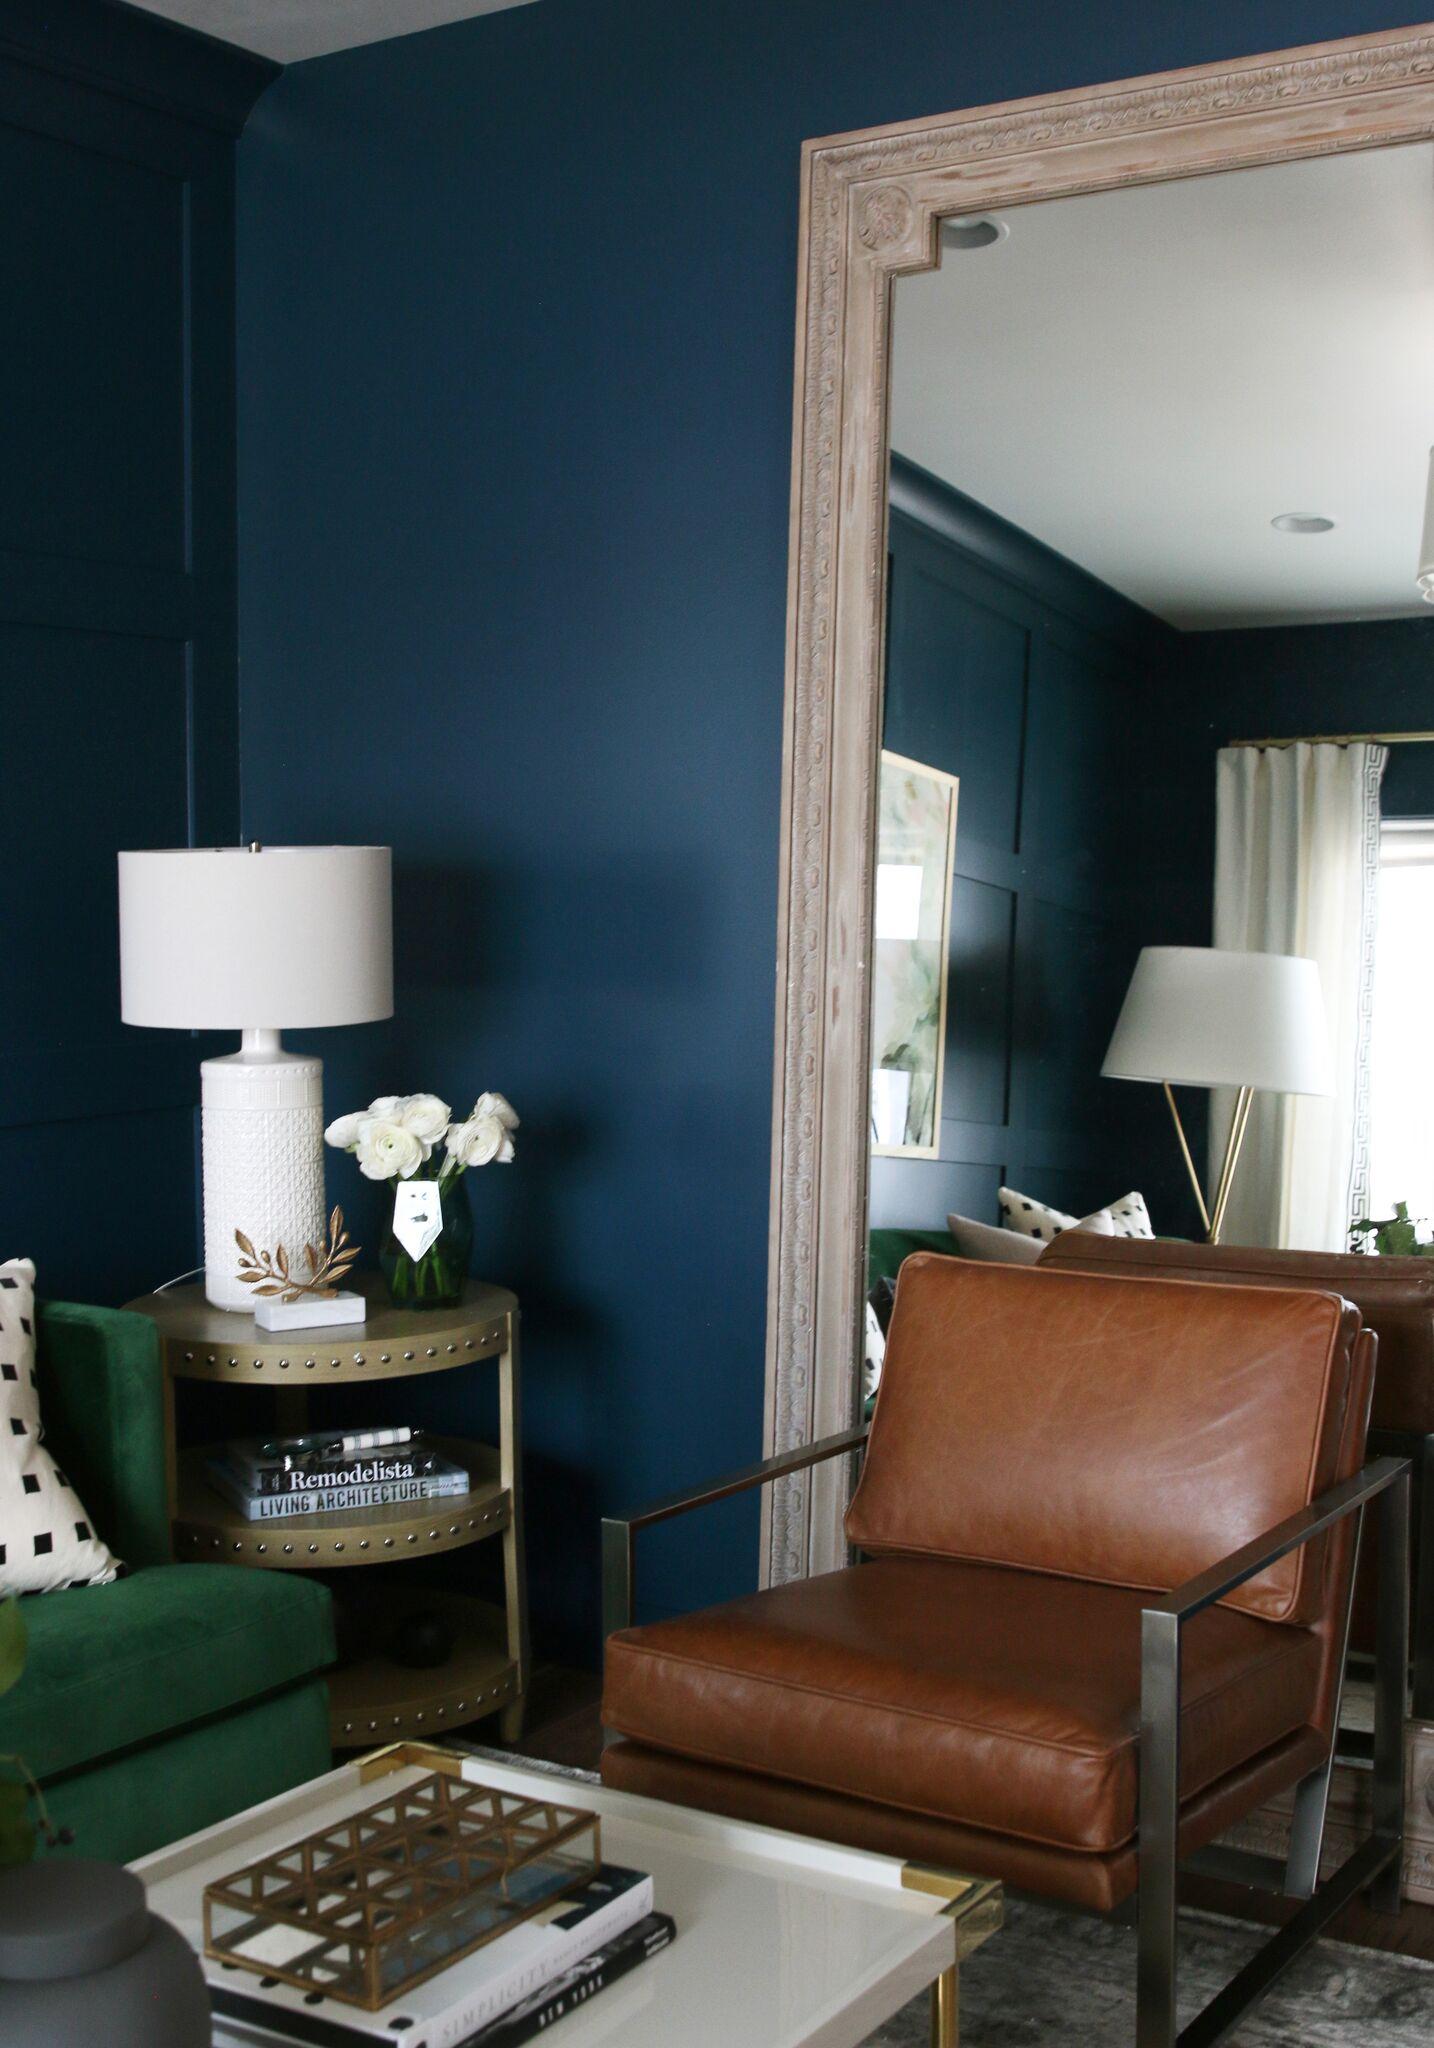 Brown chair in front floor length mirror